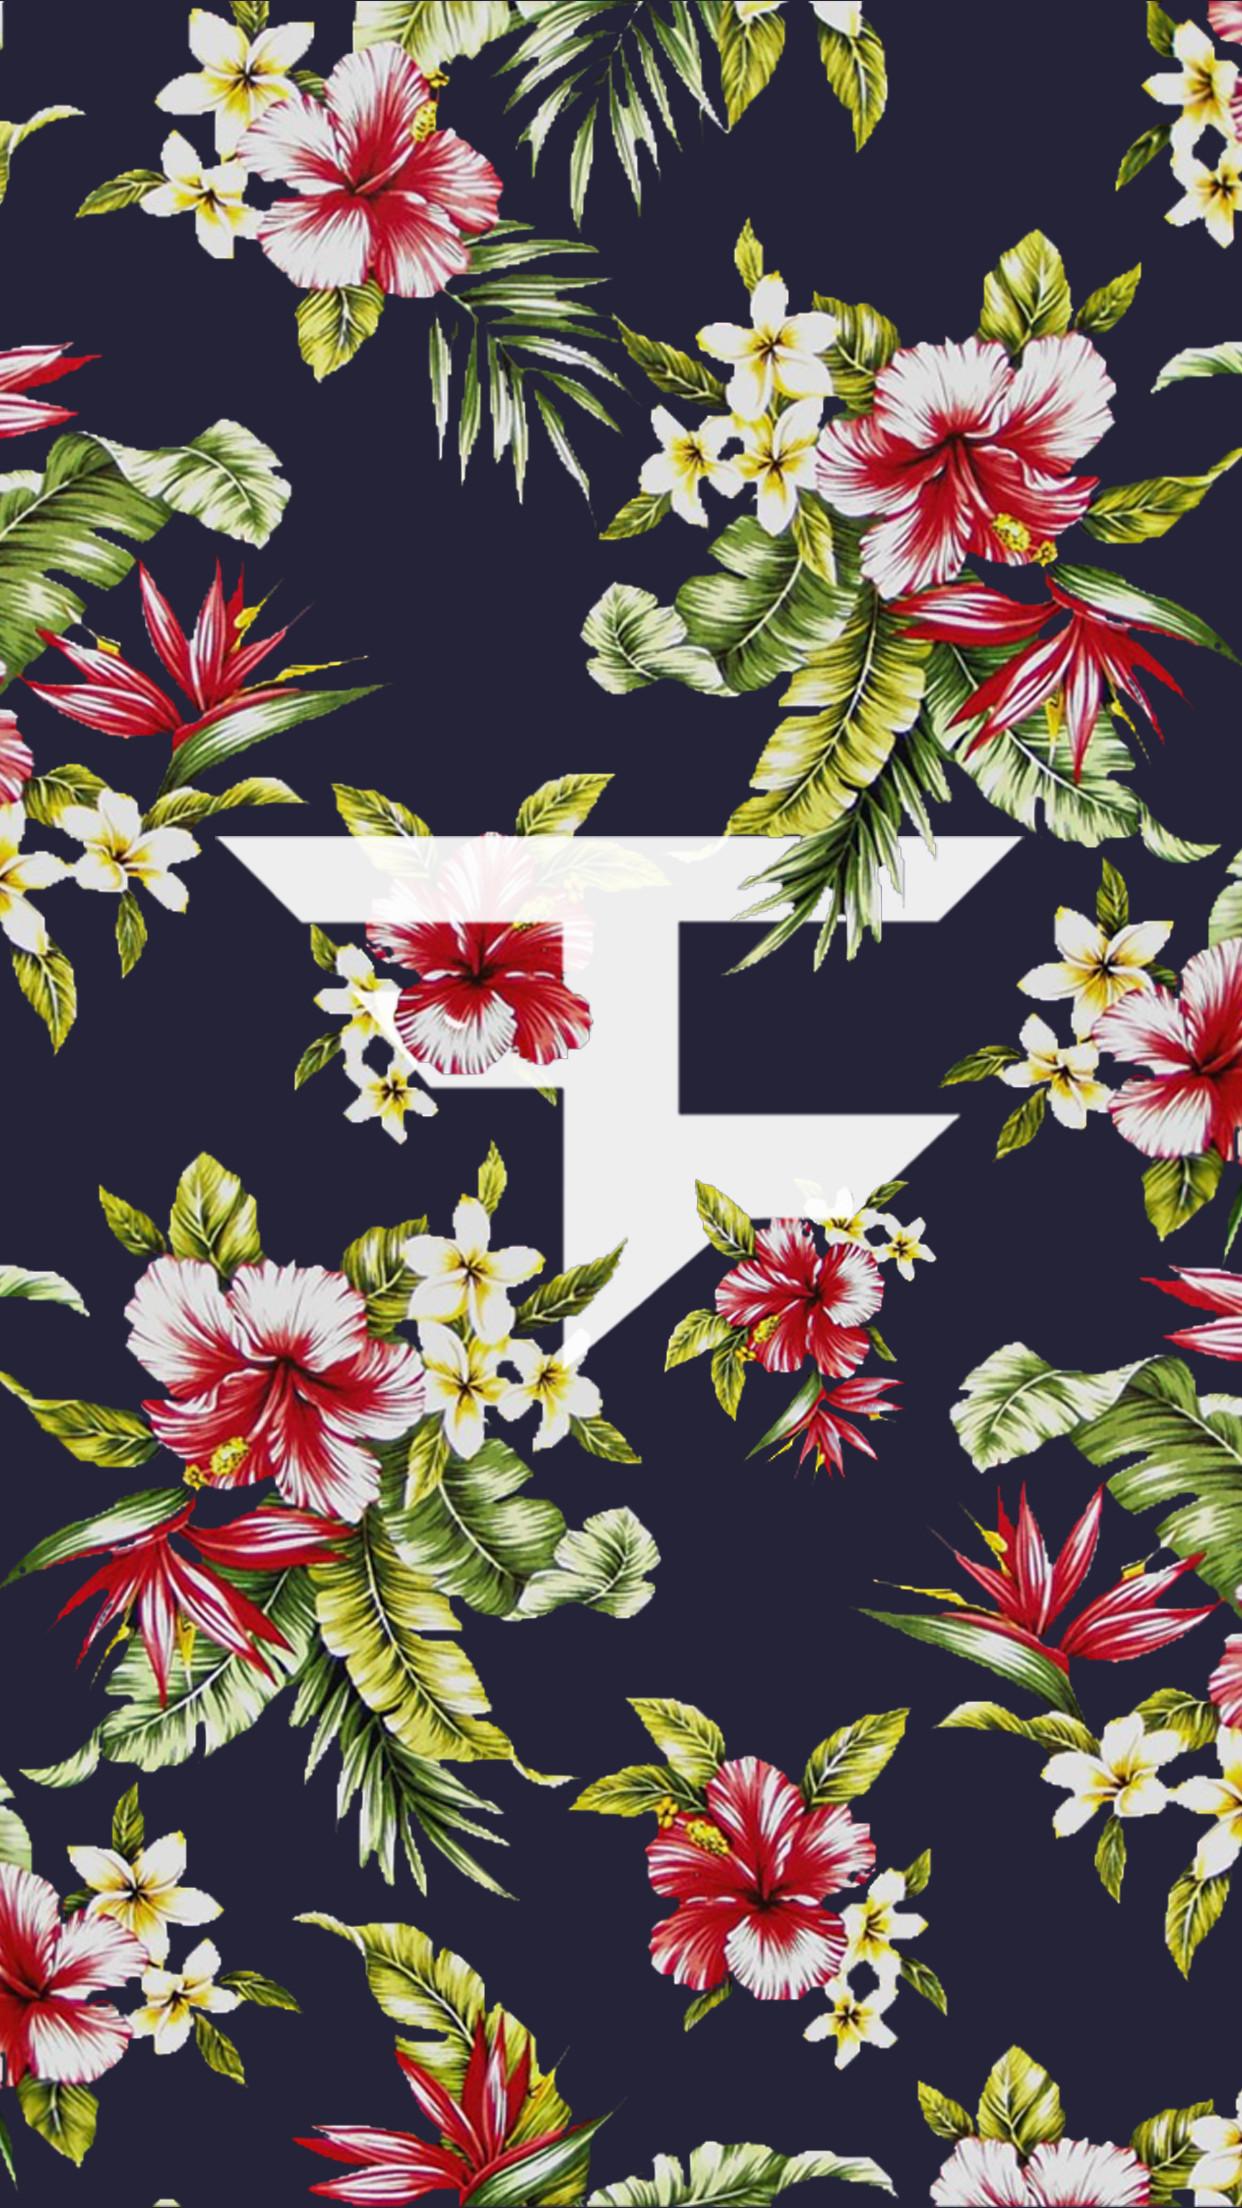 faze logo wallpaper 93 images